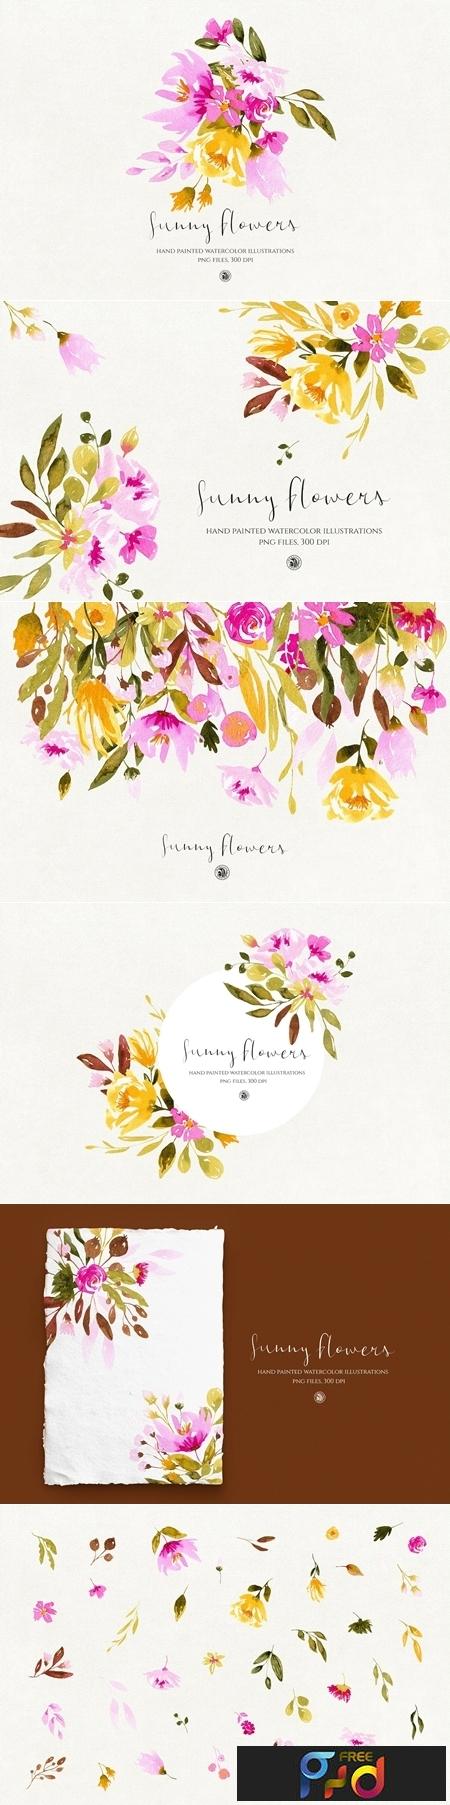 Sunny Flowers 3481637 1